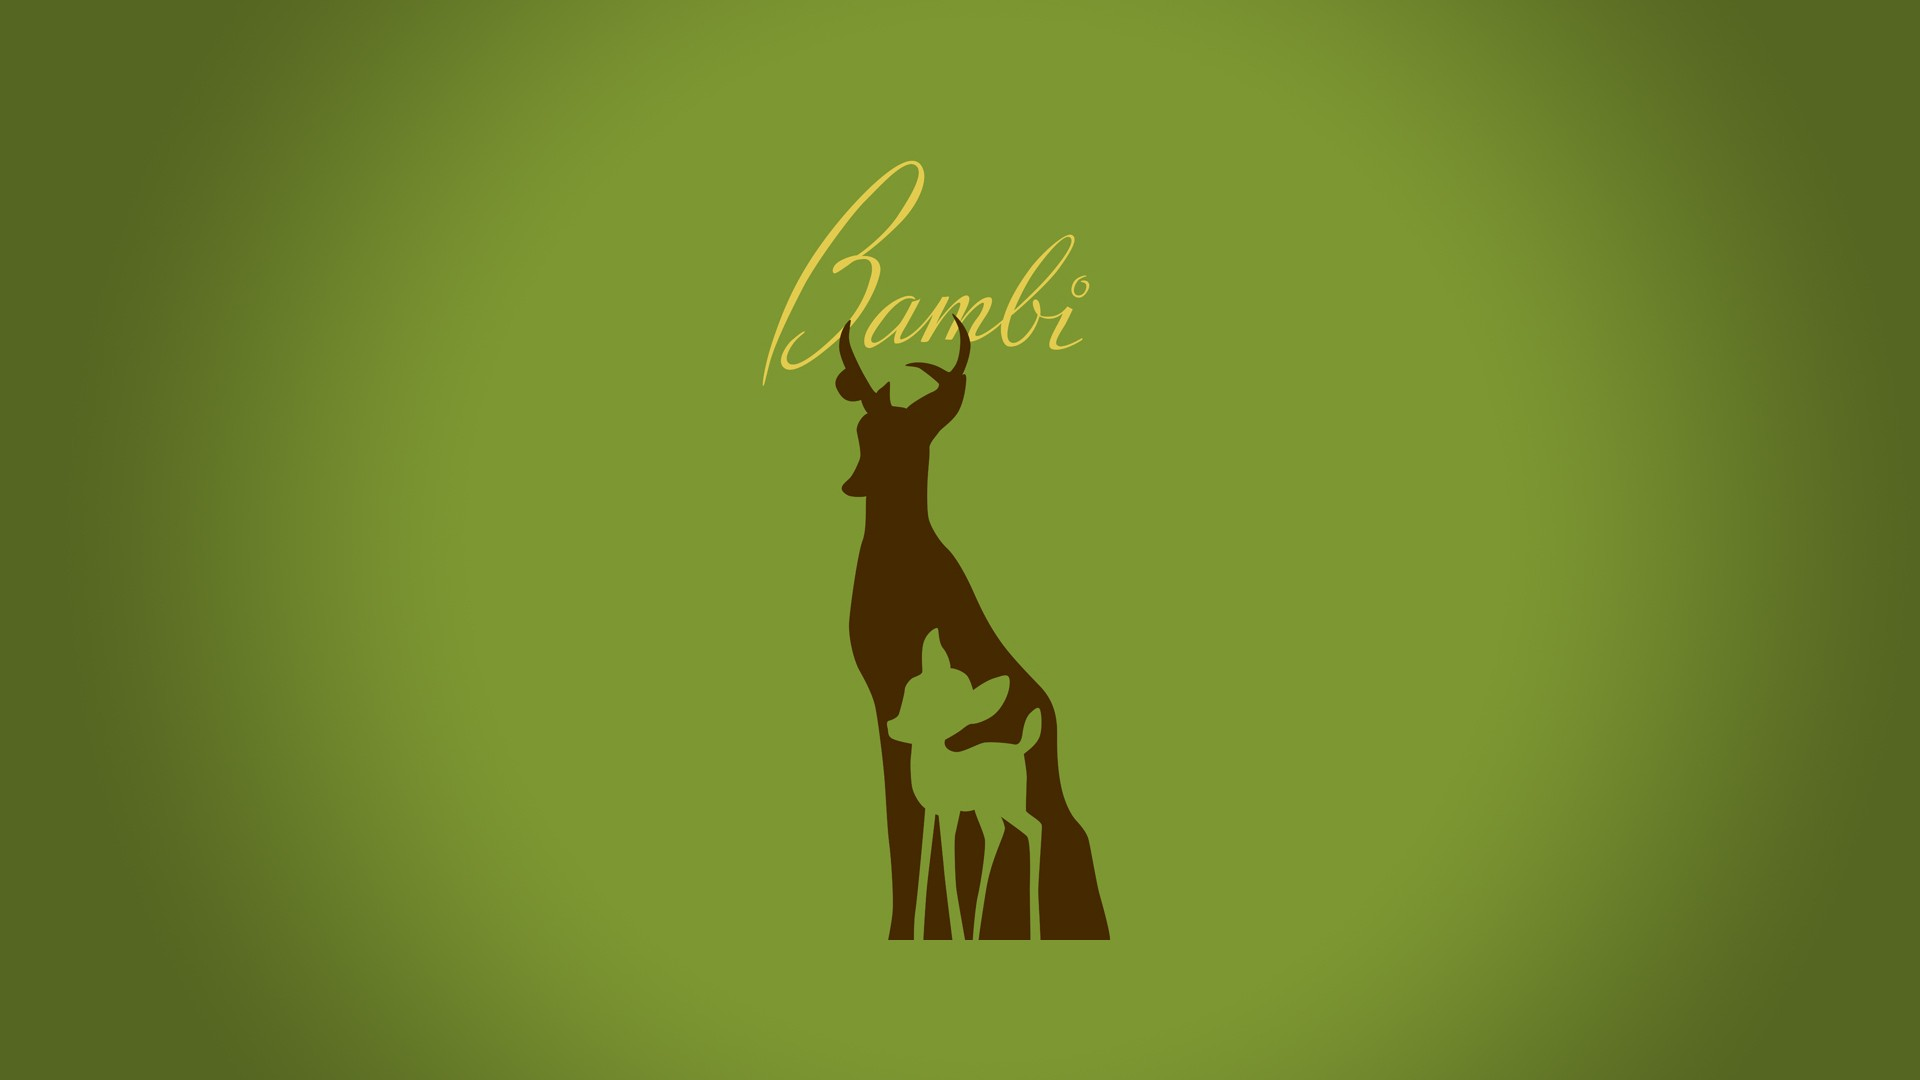 movie bambi wallpaper